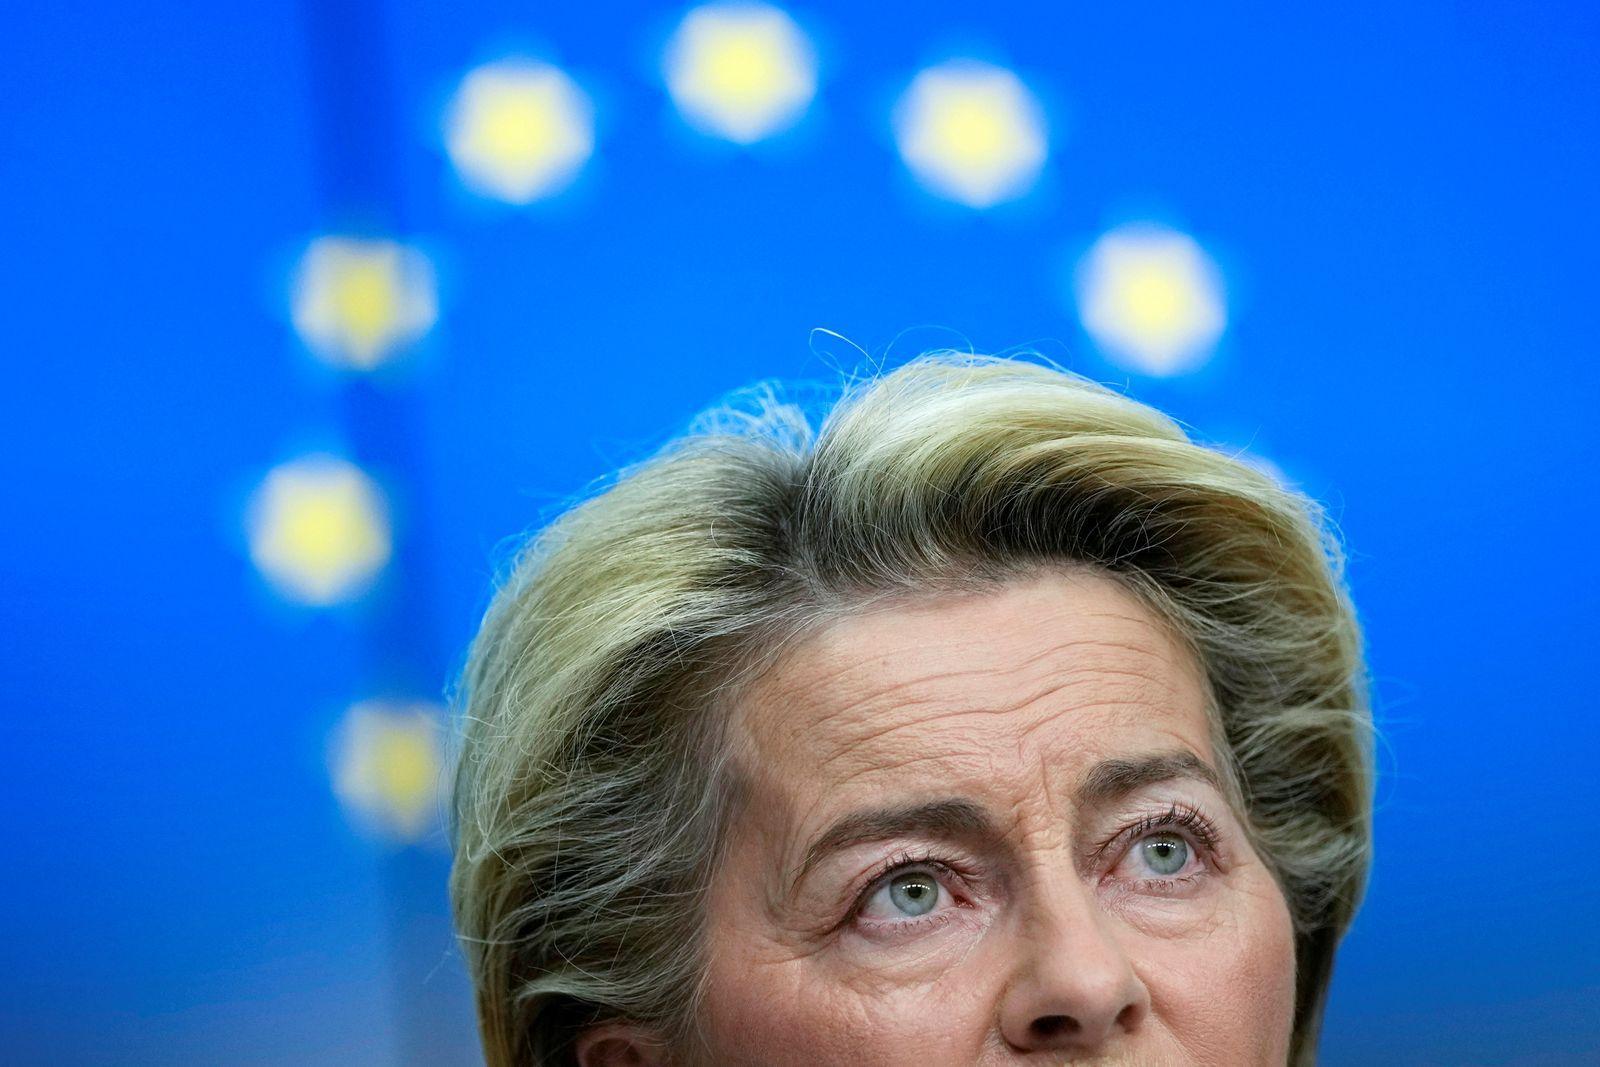 EU chiefs Michel and von der Leyen hold news conference on eve of G7